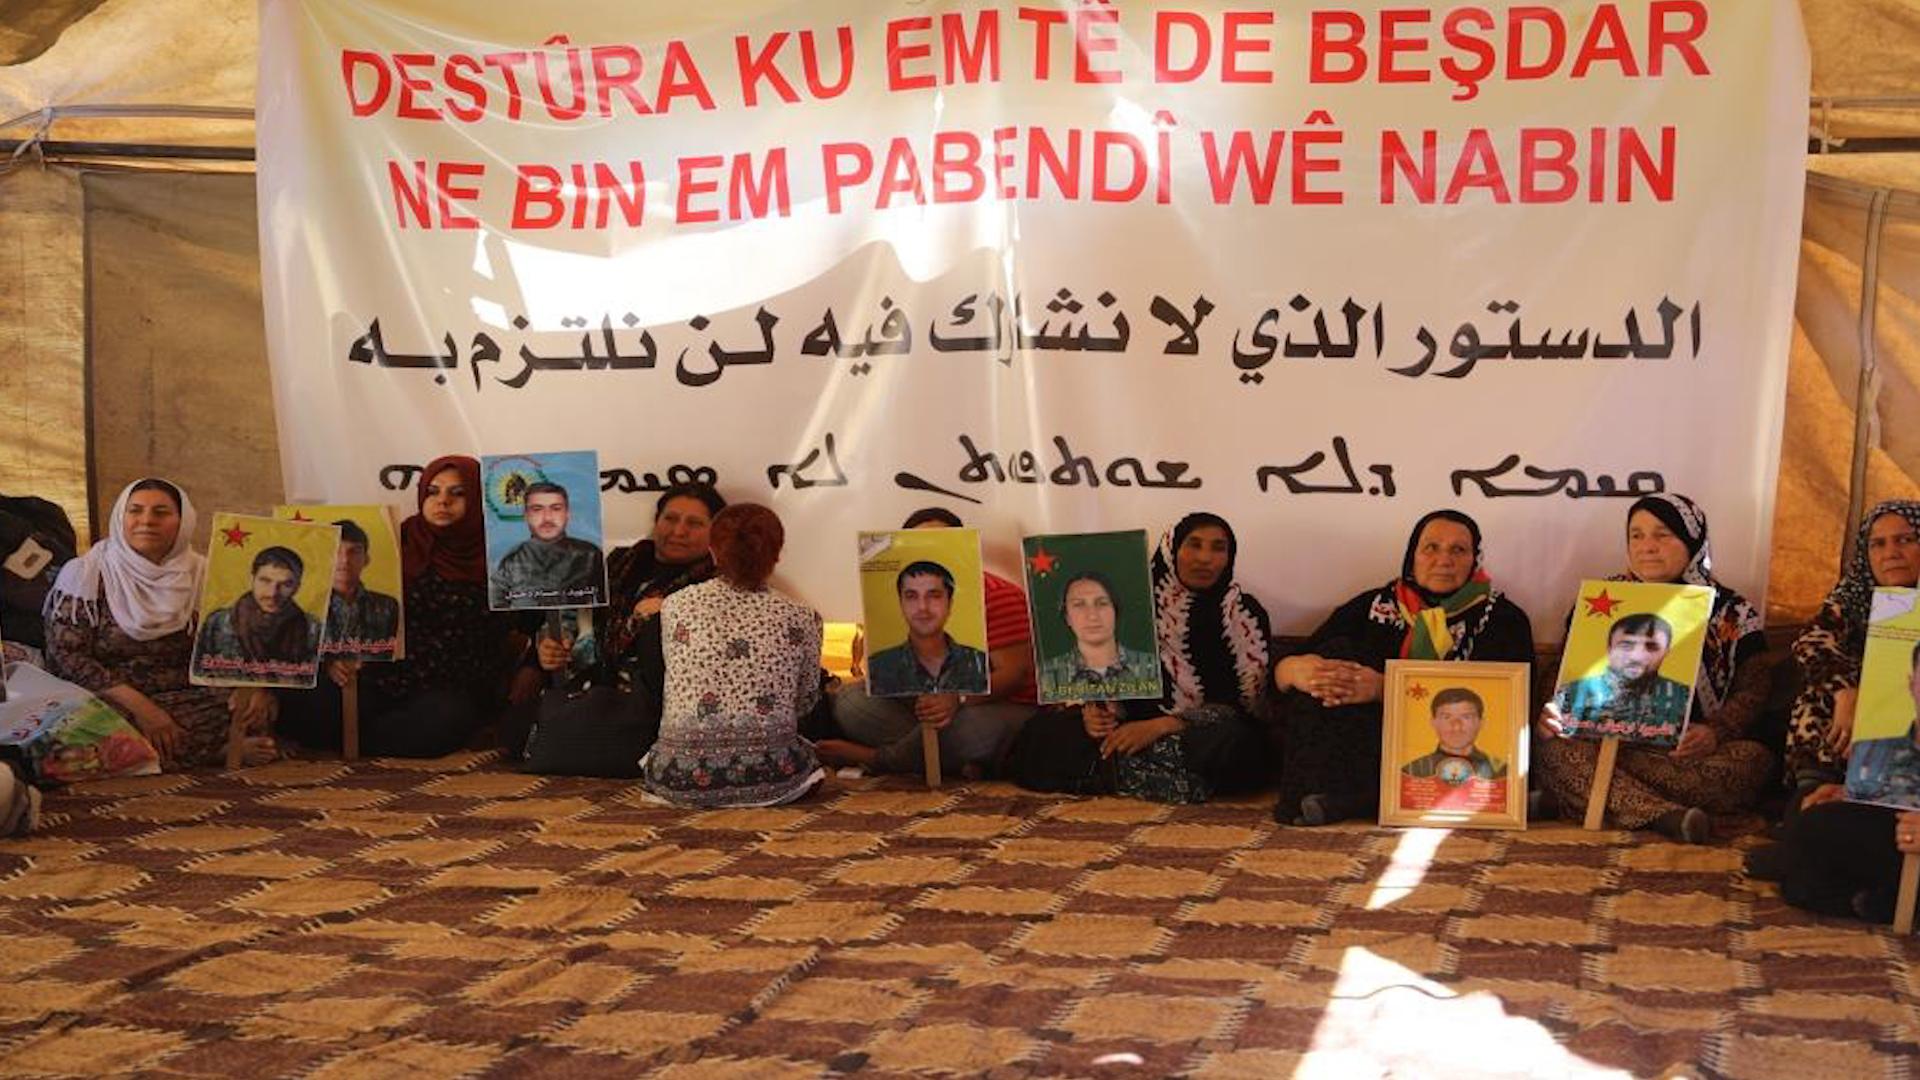 Photo of مؤتمر ستار: الدستور الذي لا نشارك فيه لن نلتزم به